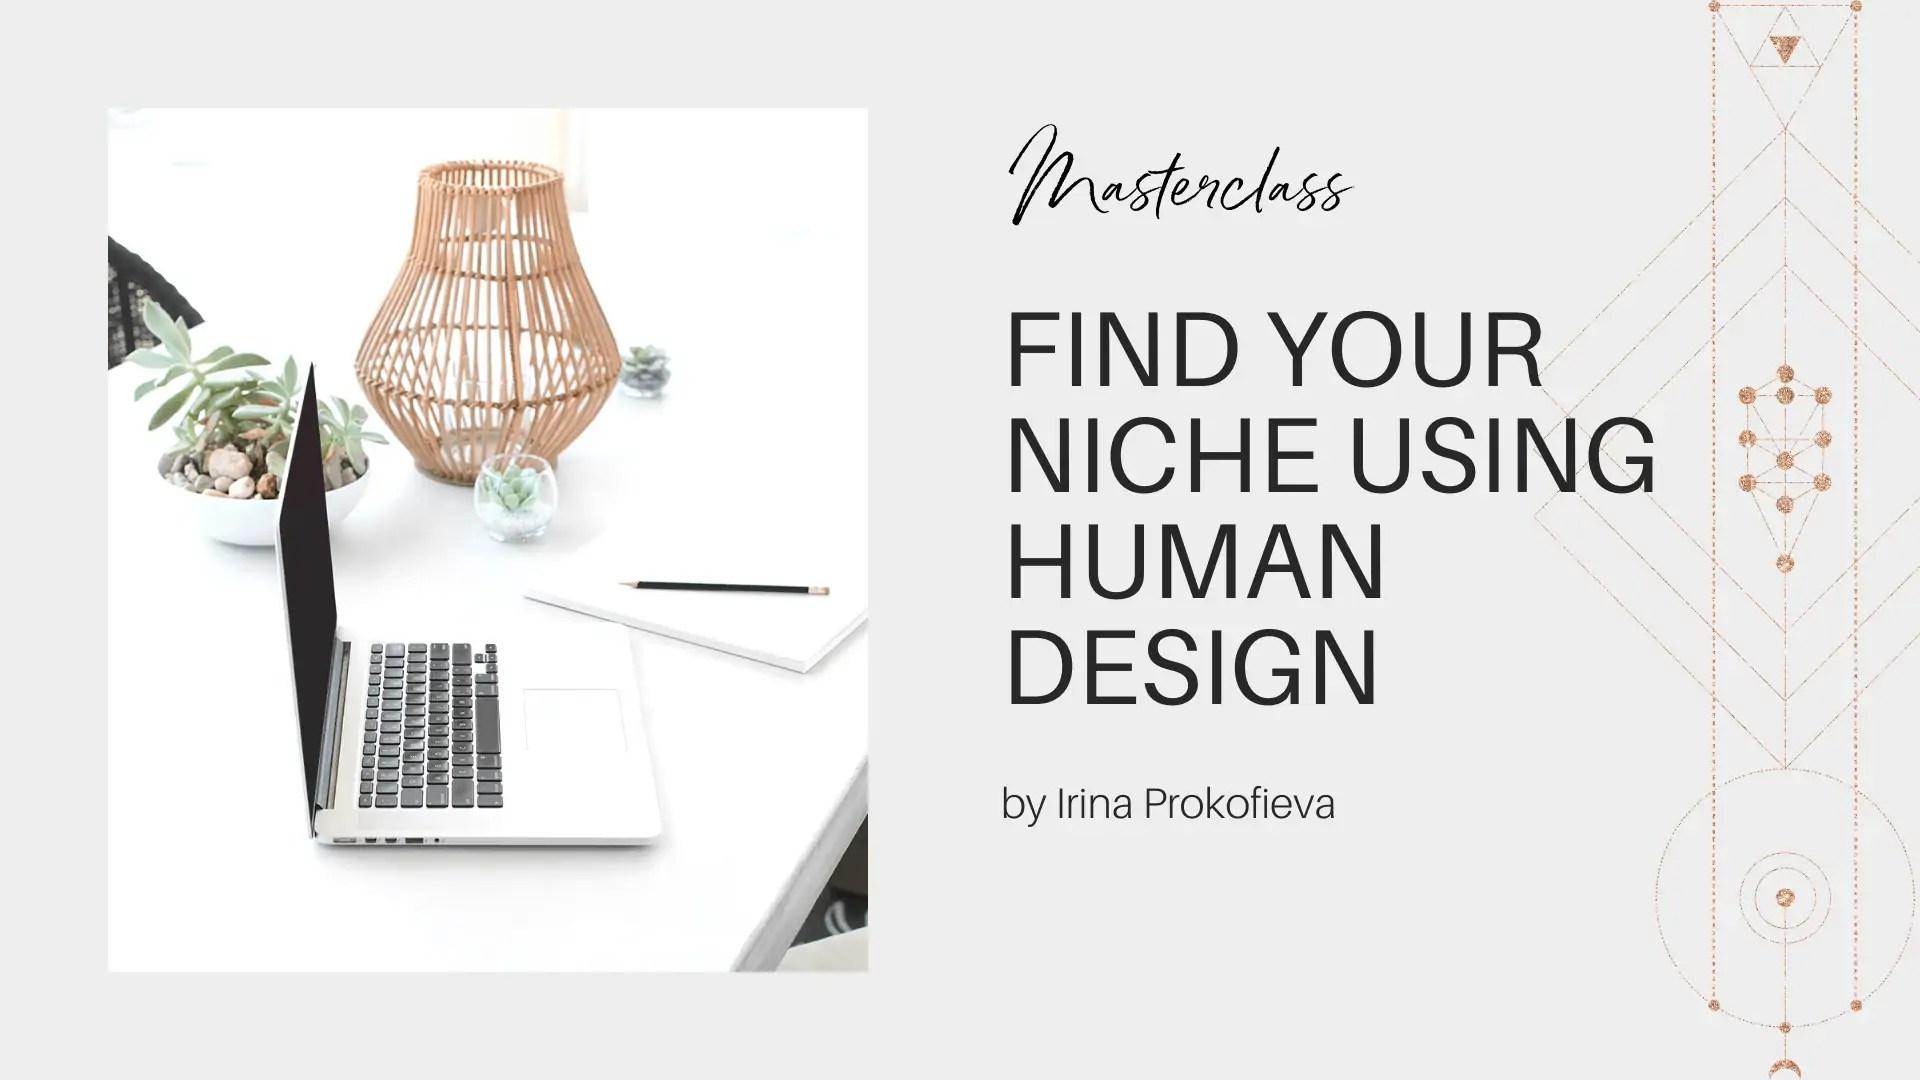 Find Your Niche Using Human Design